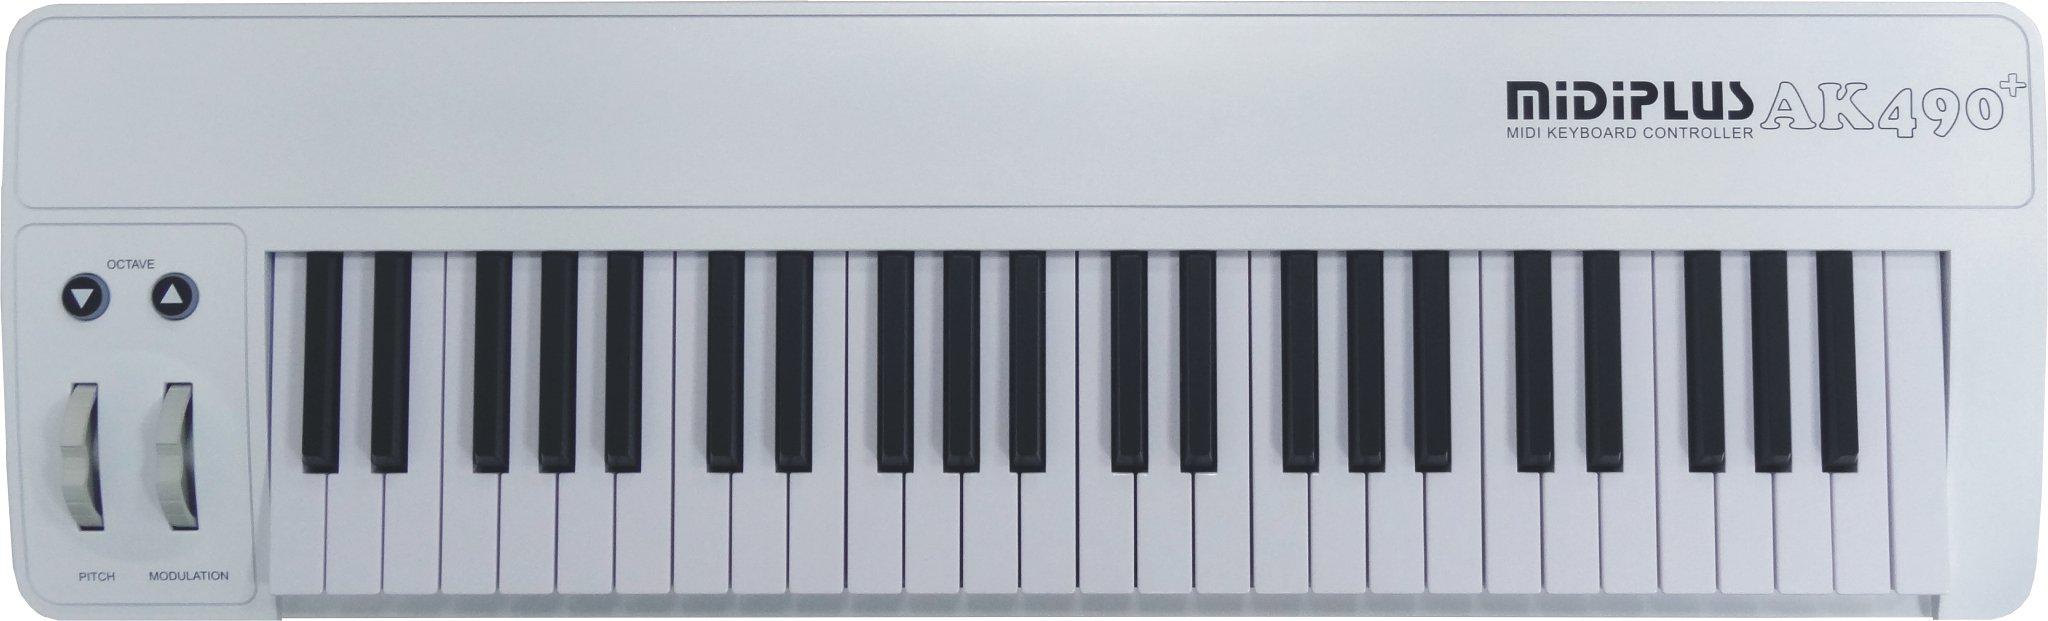 midiplus USB MIDI keyboard controller, 49-Key (AK490+)